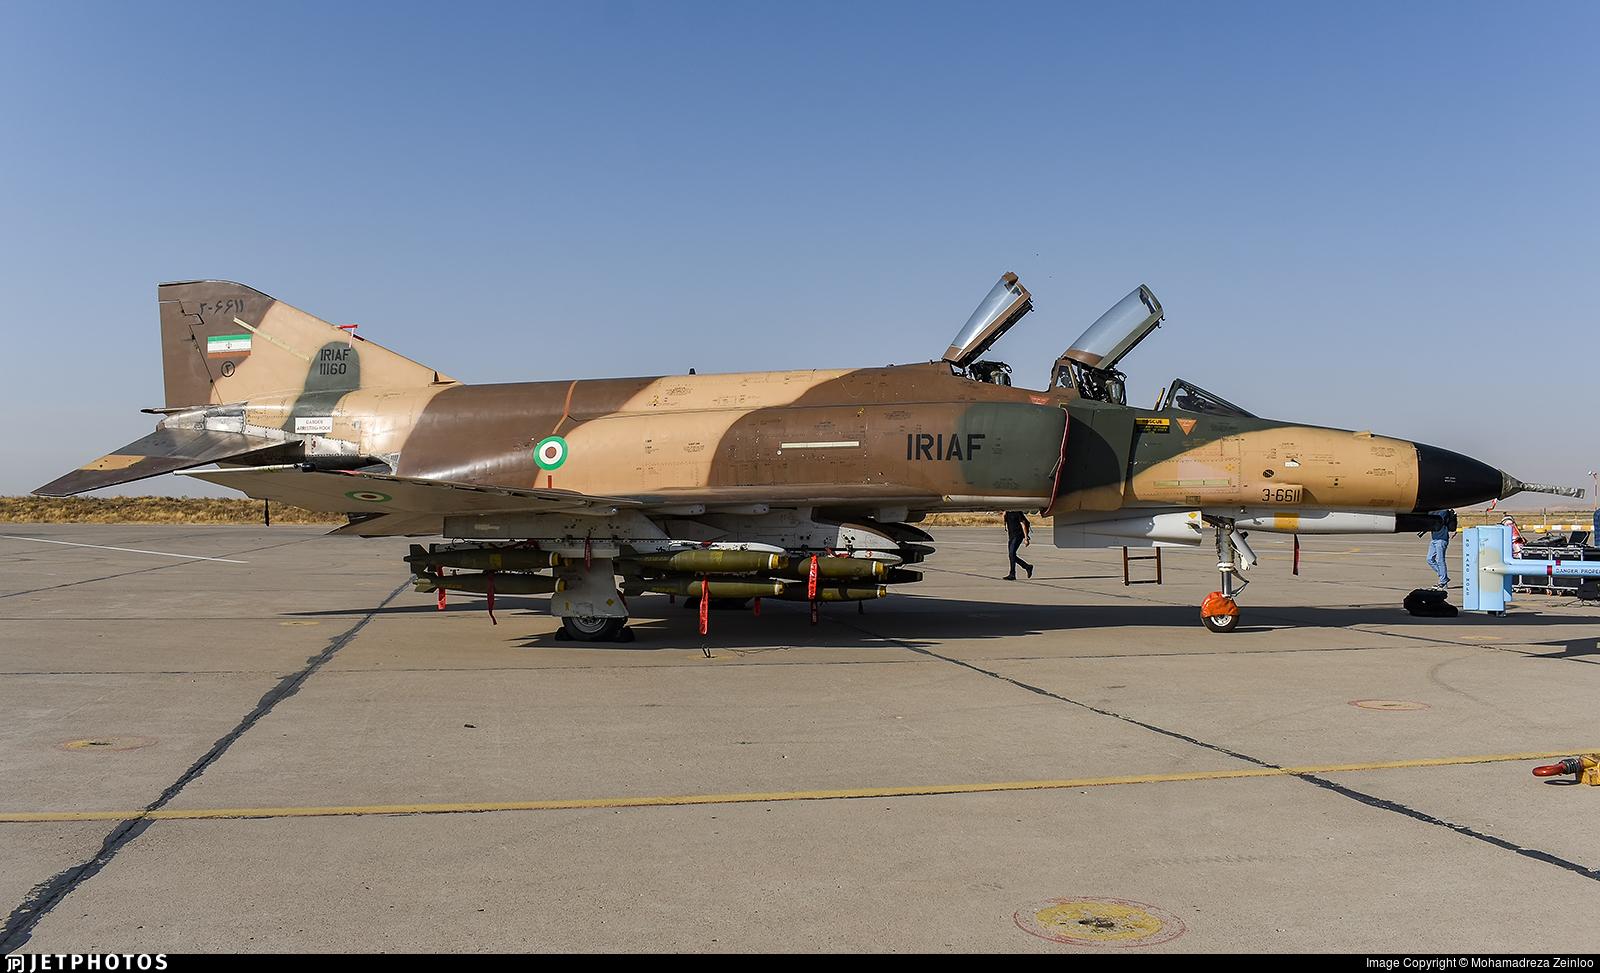 3-6611 - McDonnell Douglas F-4E Phantom II - Iran - Air Force